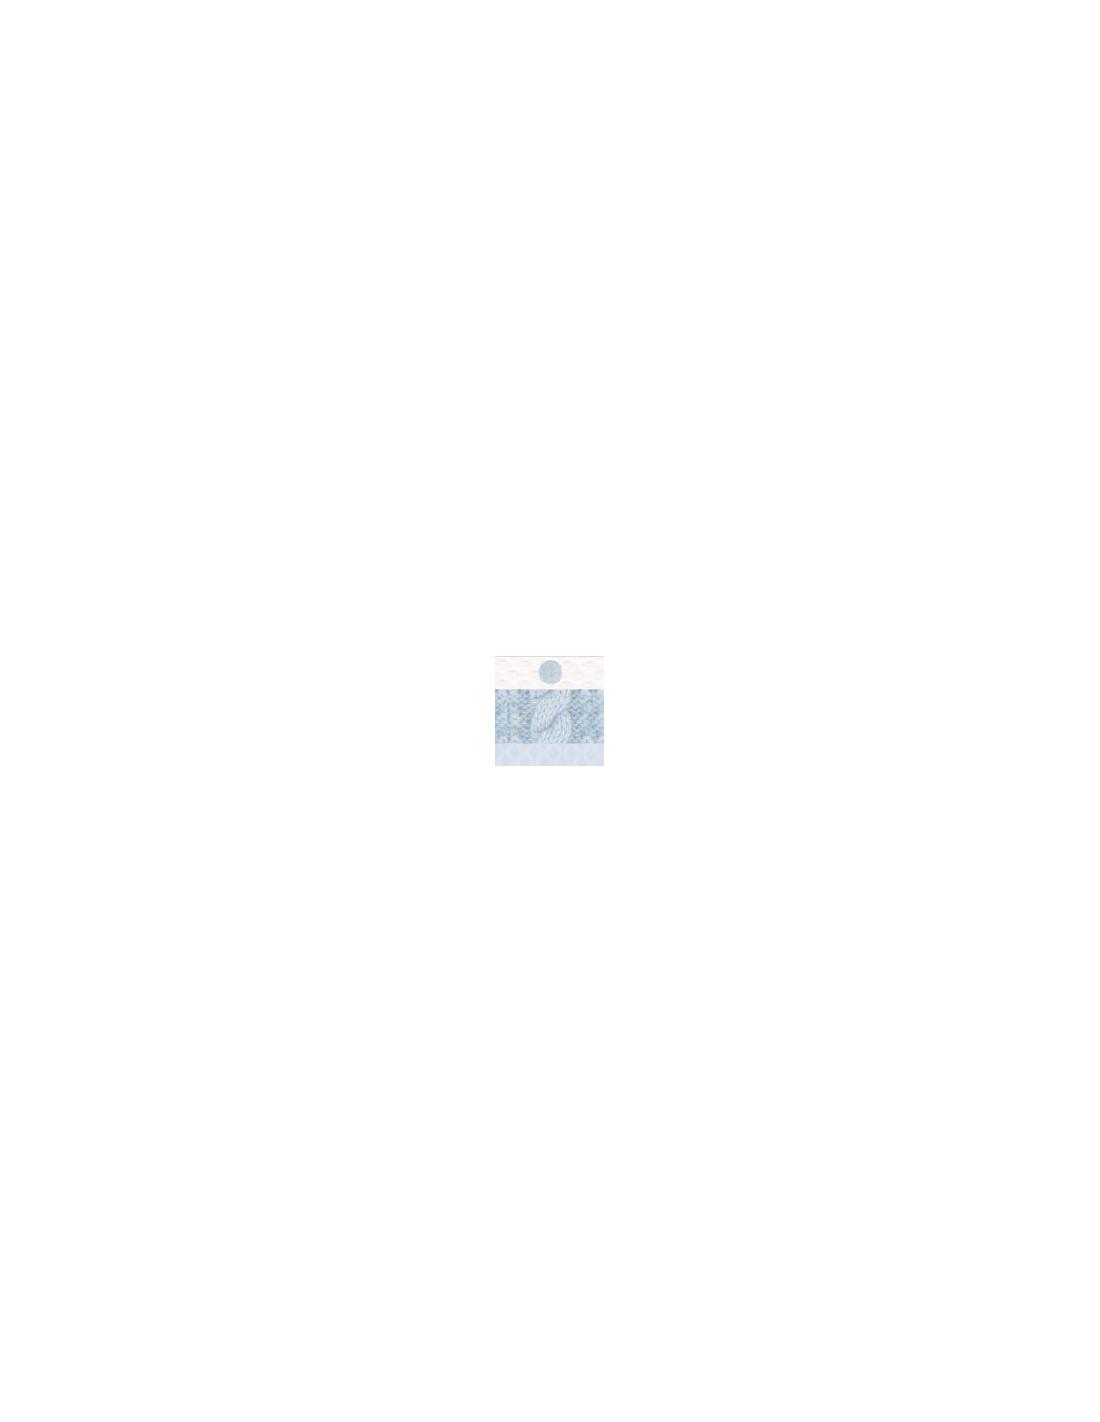 unisex color azul Uzturre 72AD-BEBE/_A Saco 3 usos